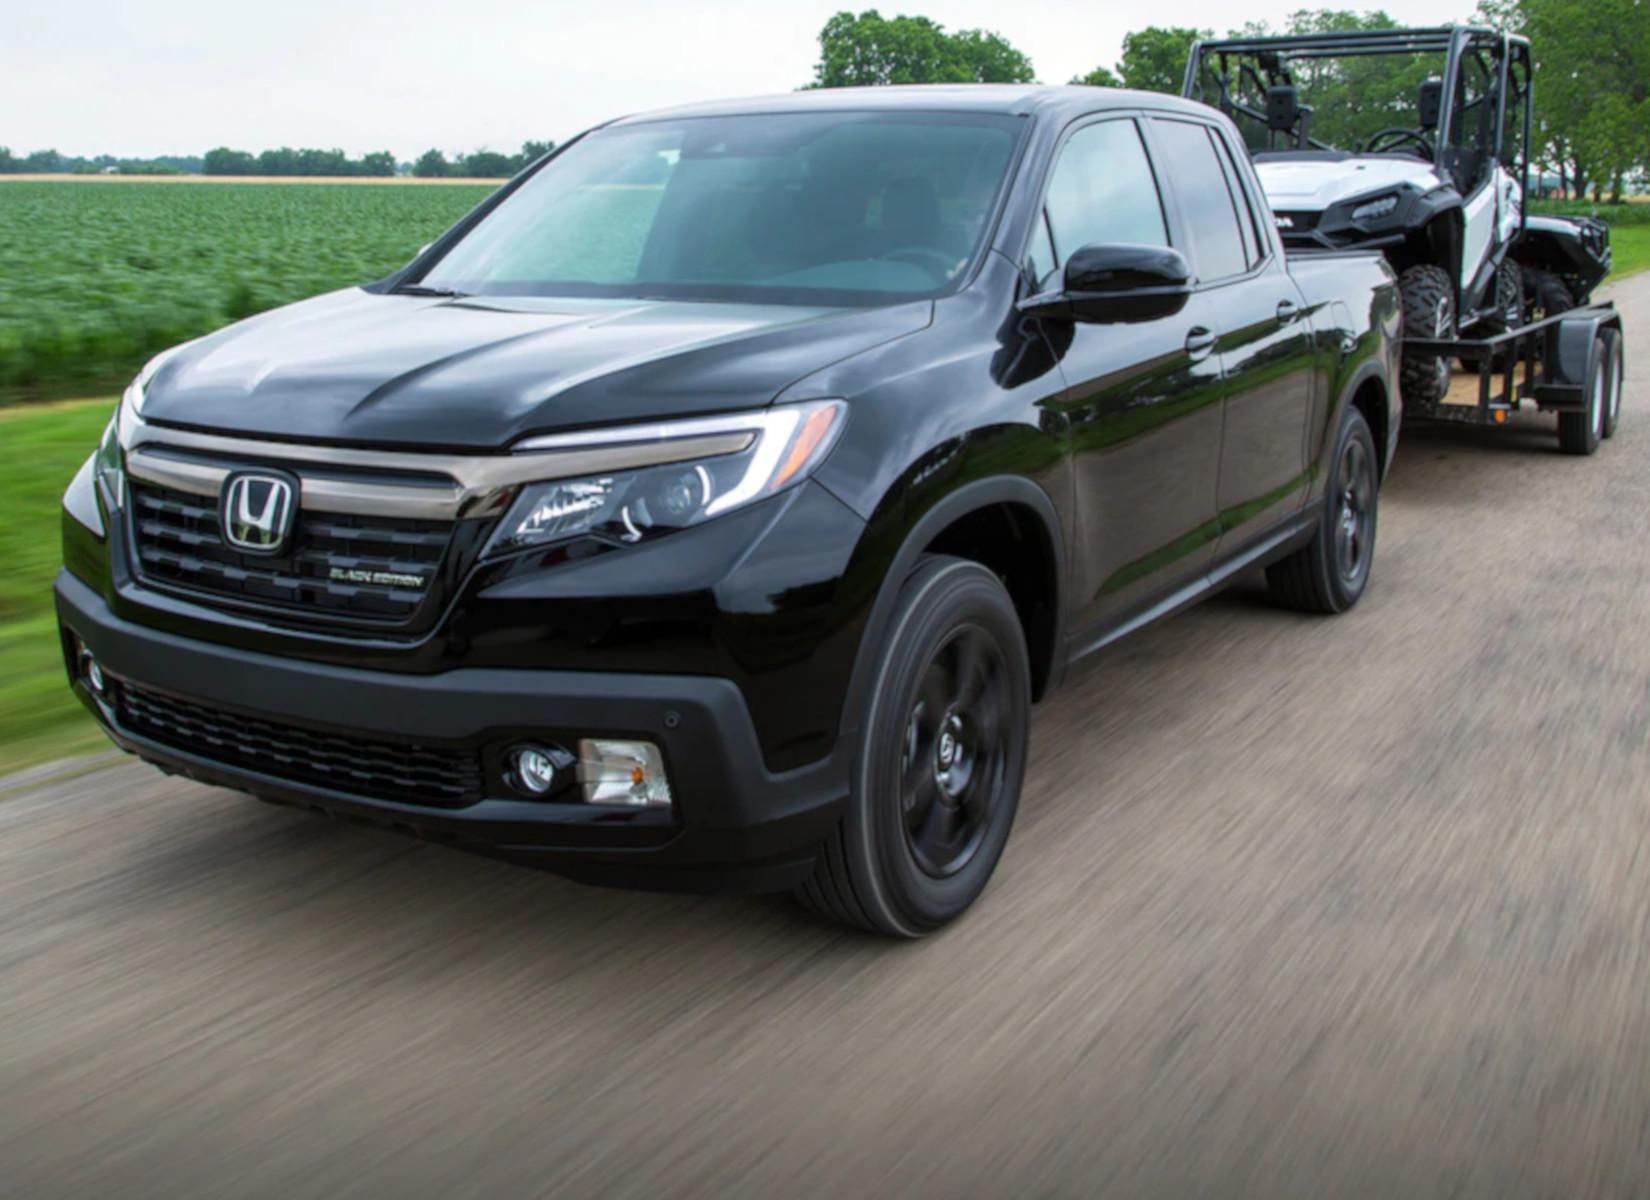 The high-performance 2019 Honda Ridgeline